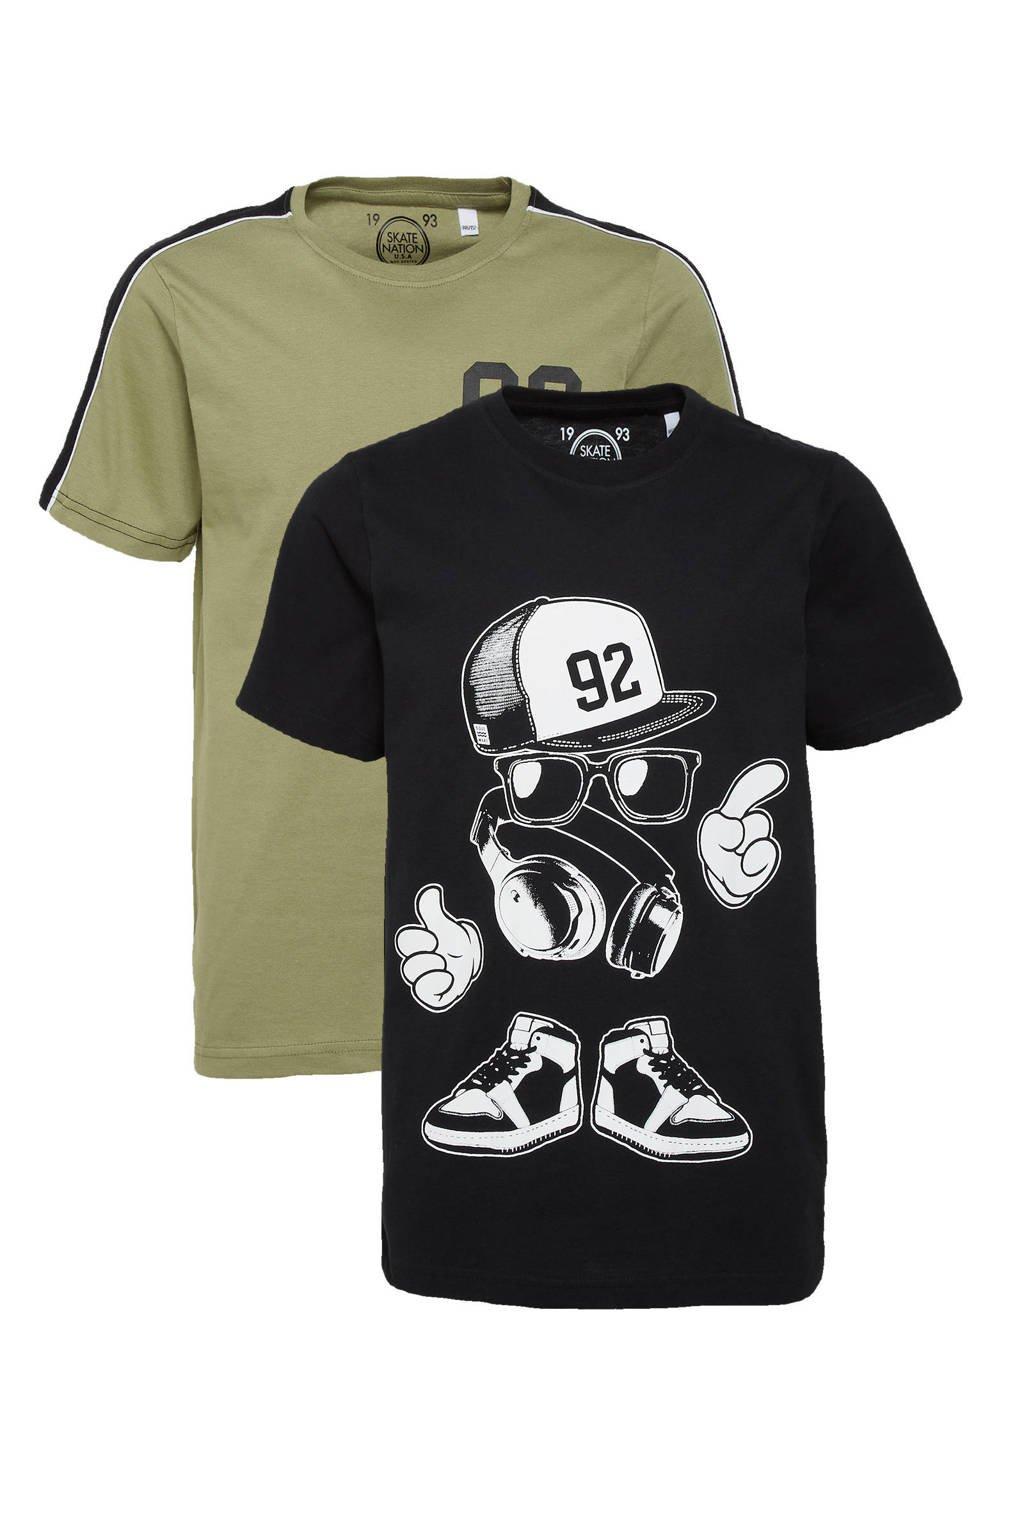 C&A Skate Nation T-shirt - set van 2 blauw/olijfgroen, Zwart